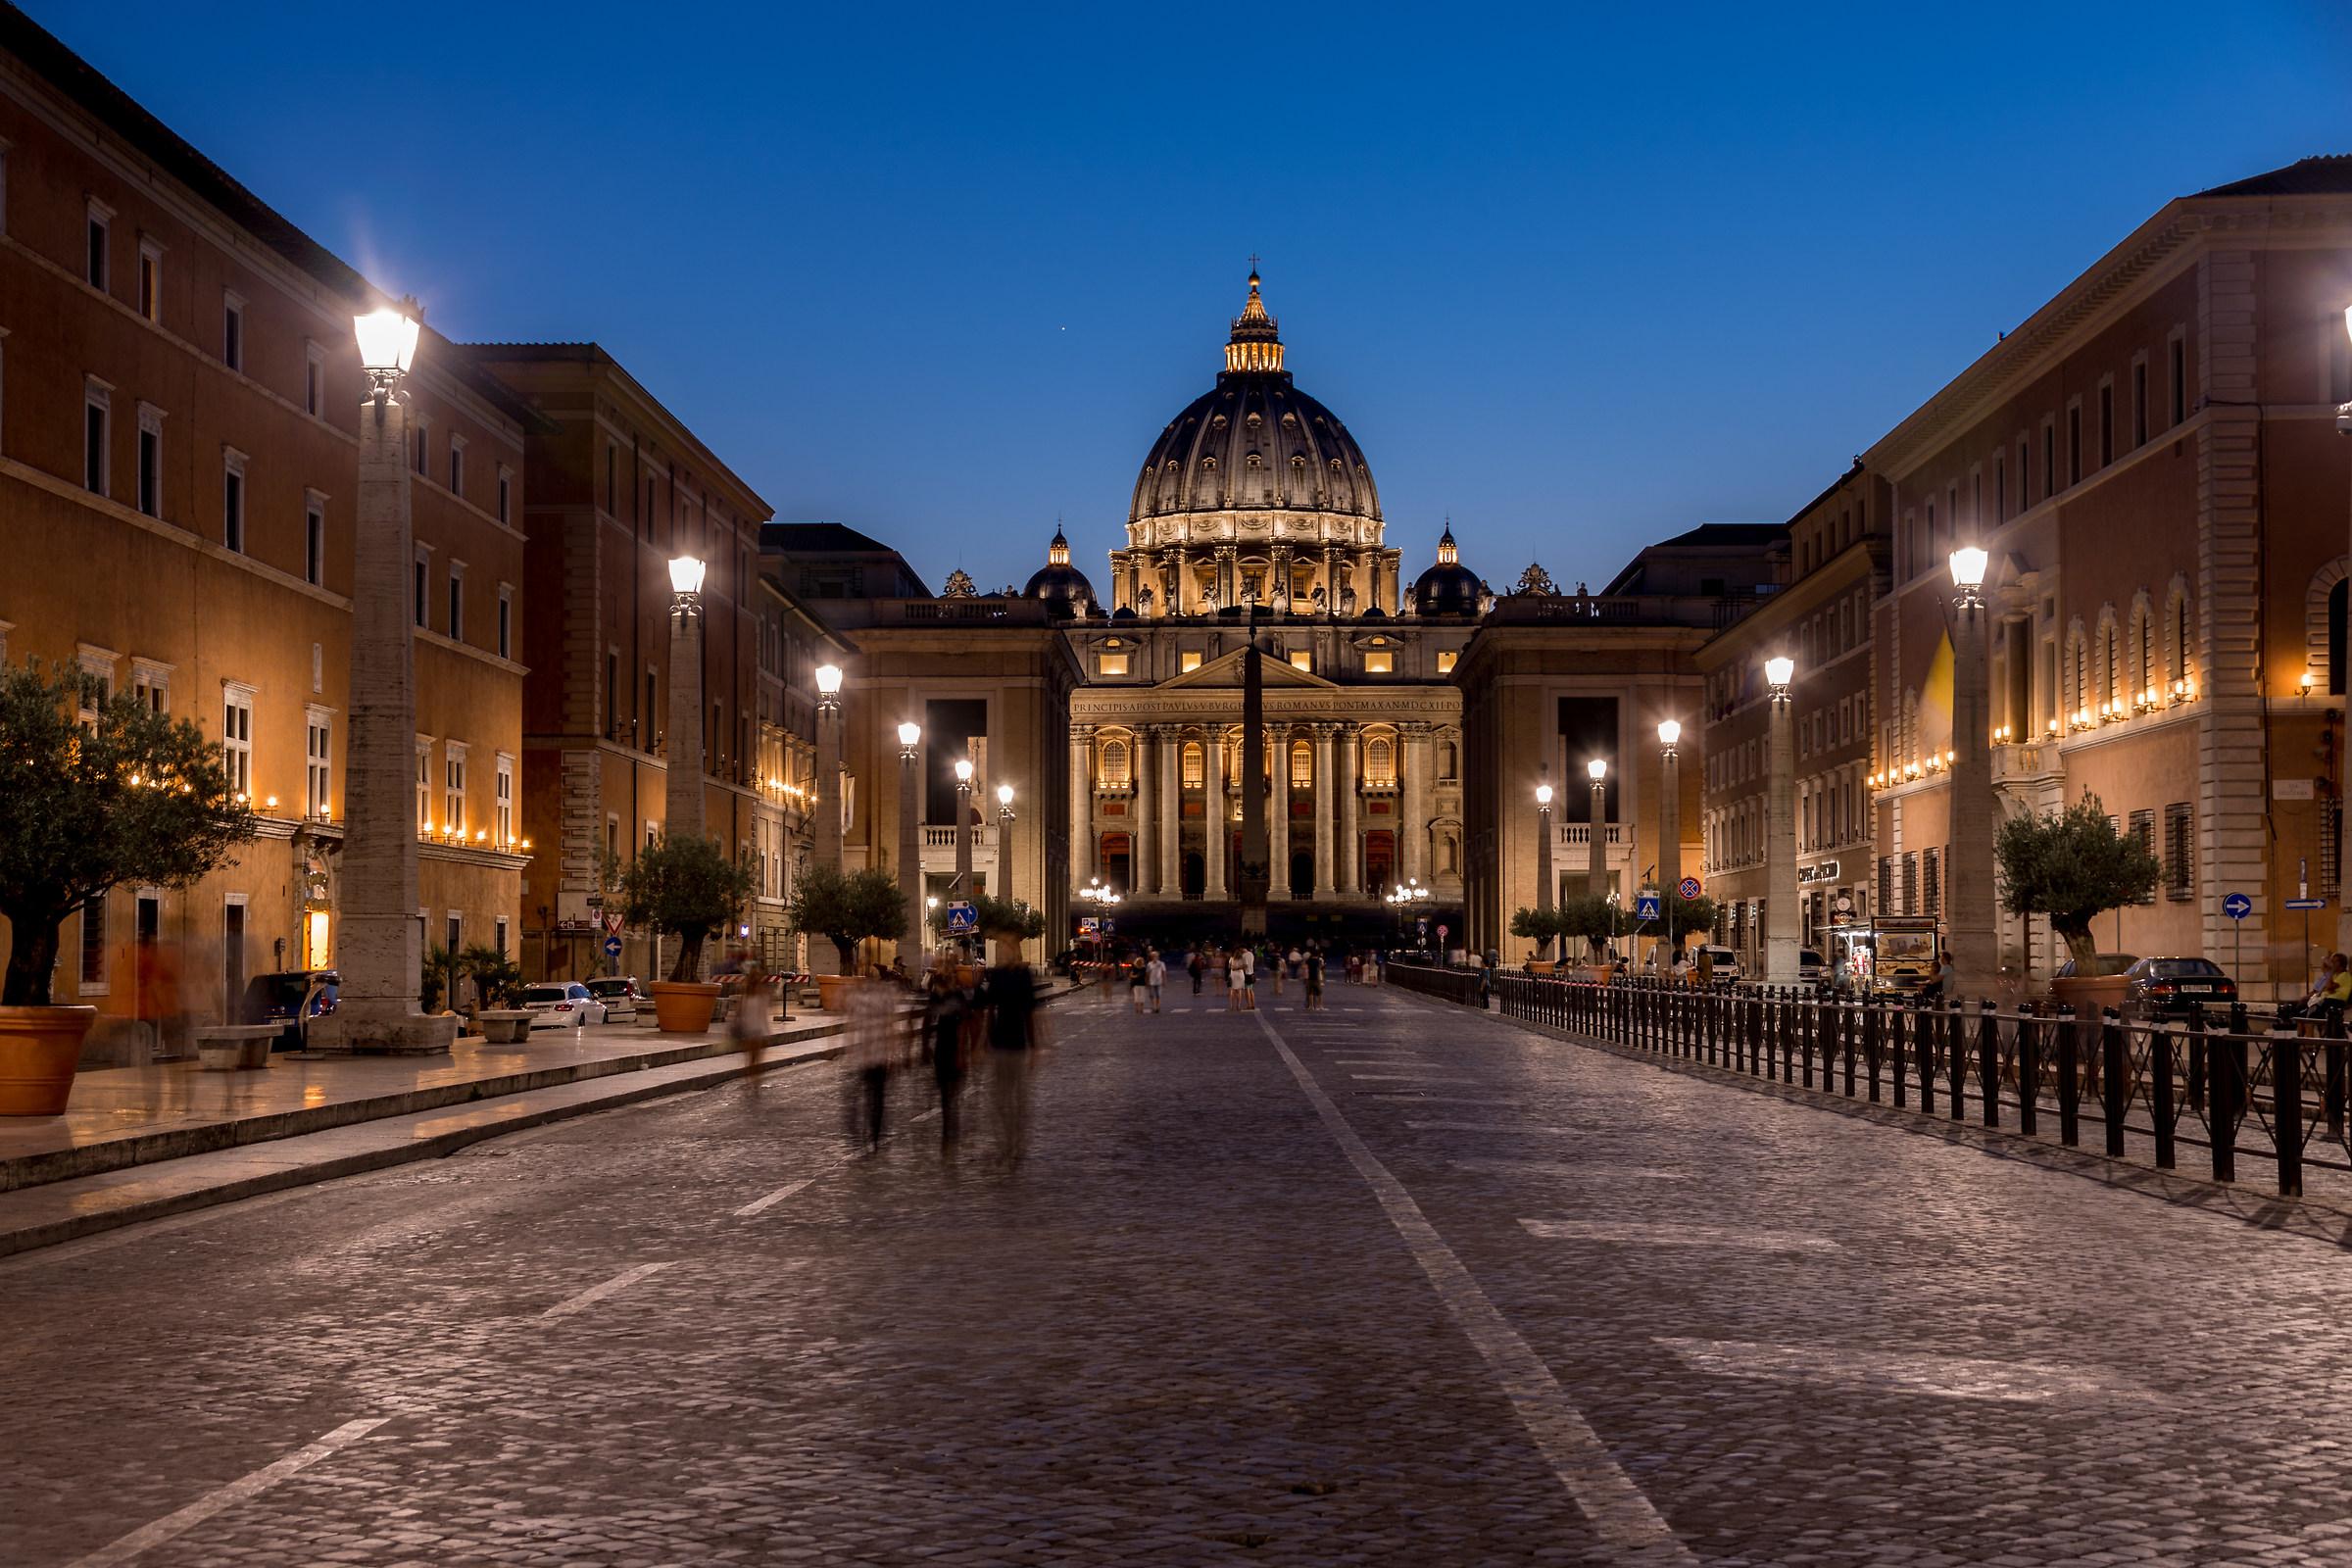 Saint Peter...